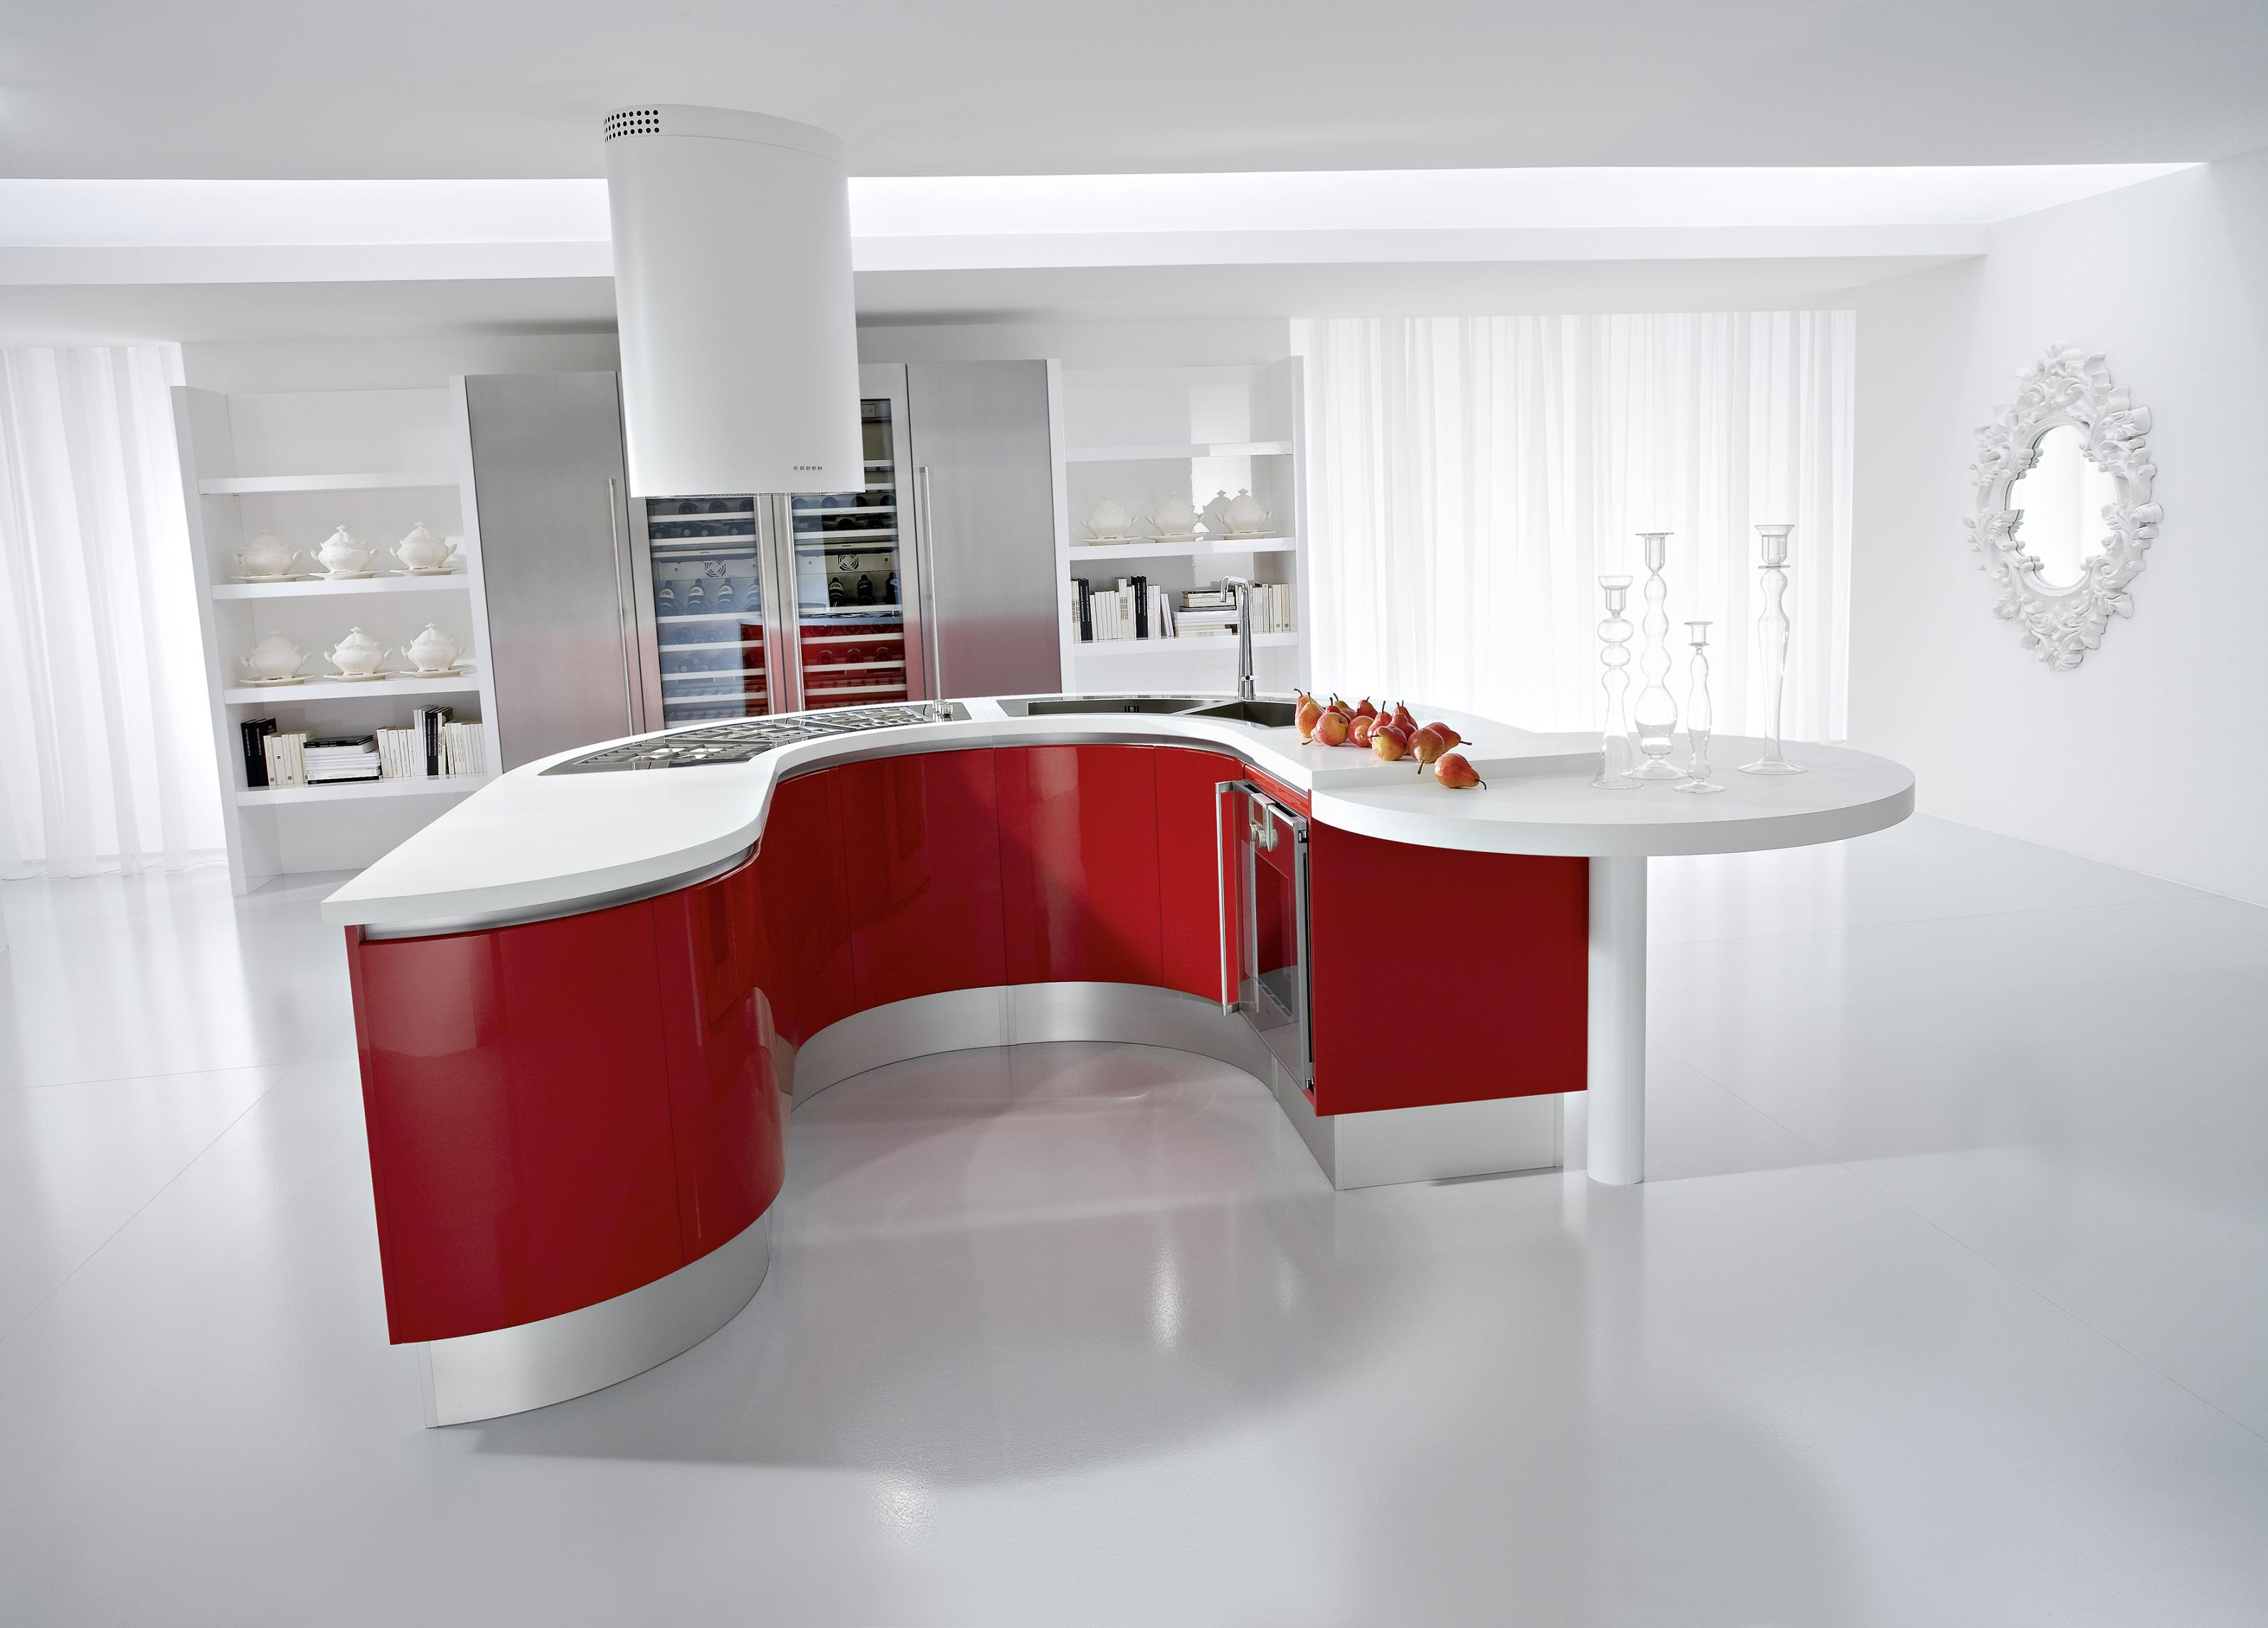 red kitchen cabinets remoldeling kitchens